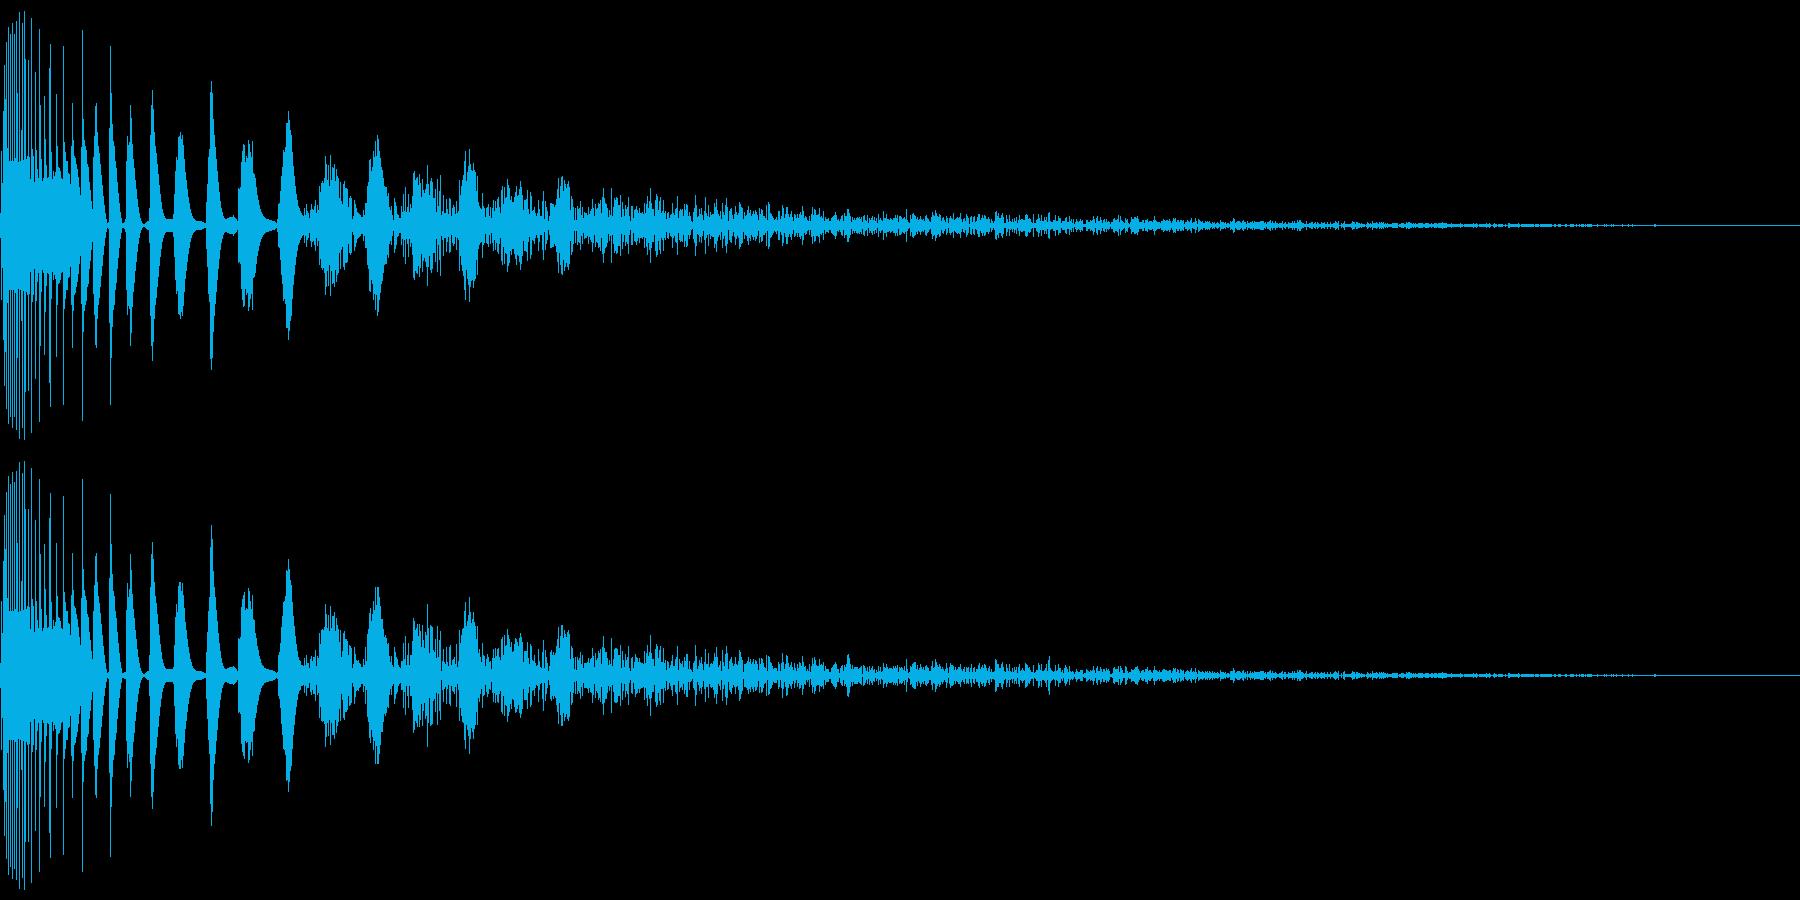 DTM Snare 7 オリジナル音源の再生済みの波形